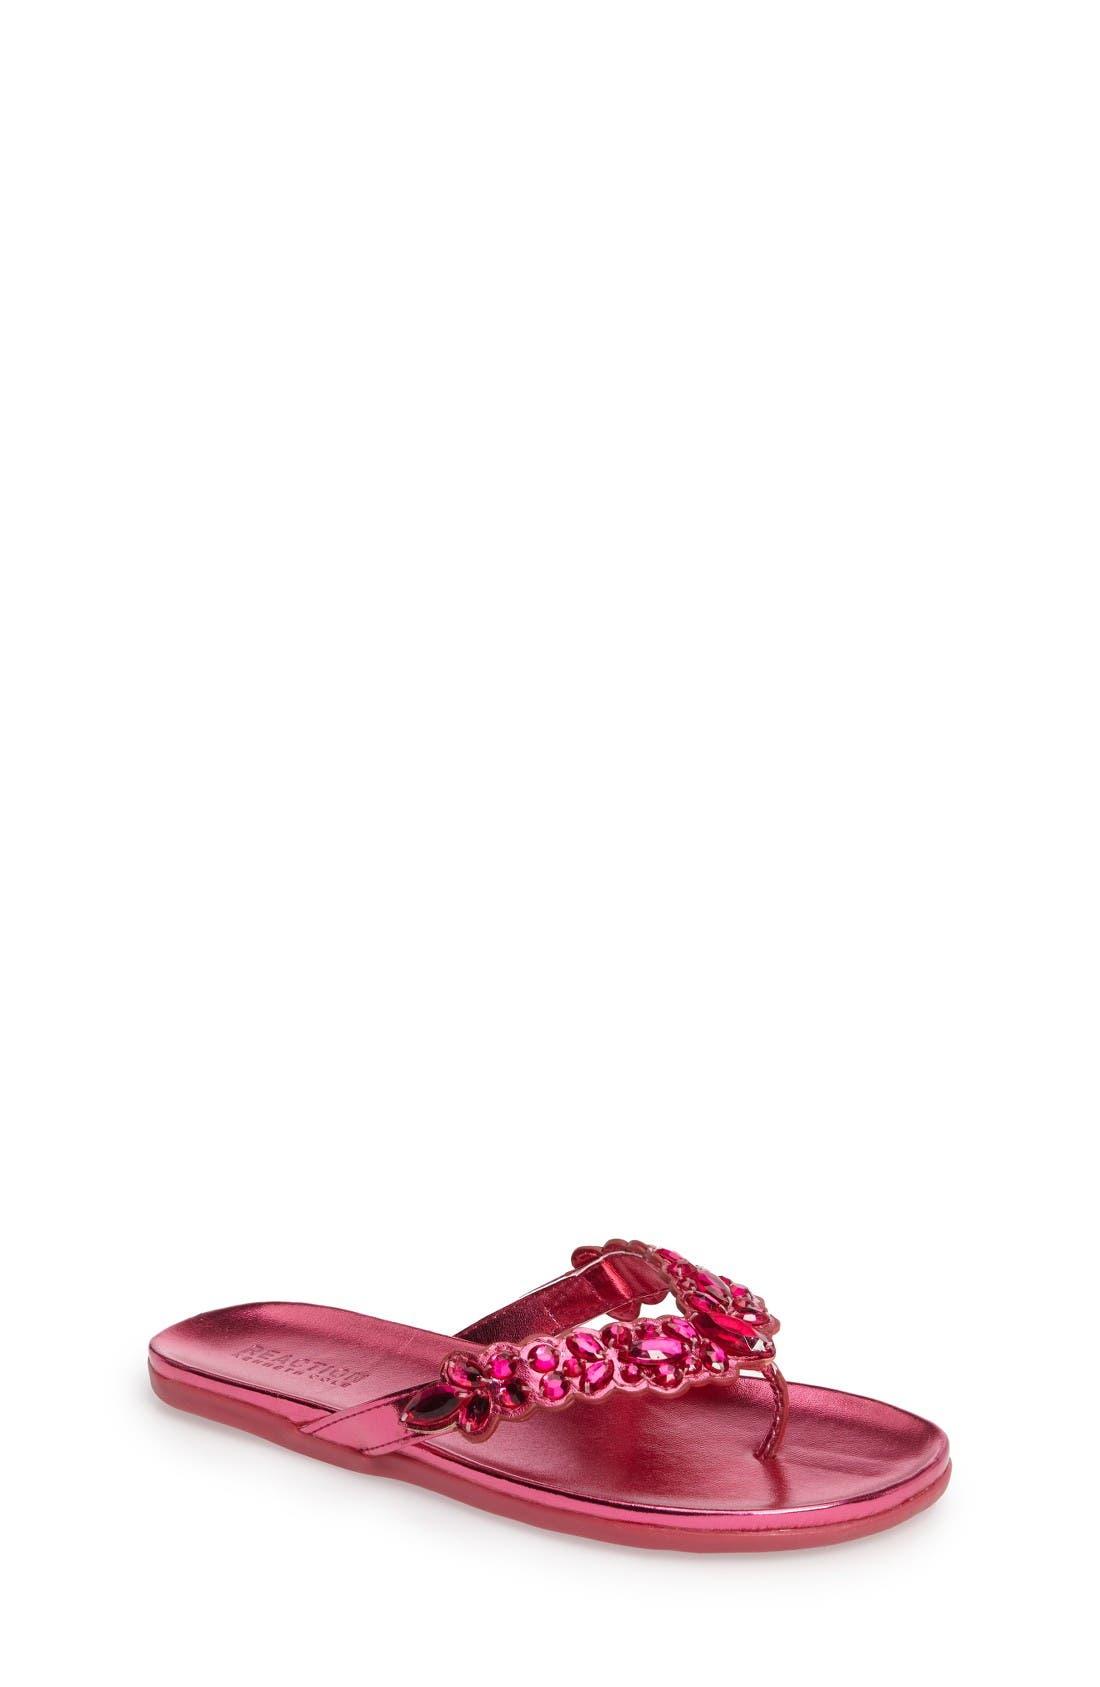 KENNETH COLE NEW YORK Slim Shadee Embellished Flip Flop